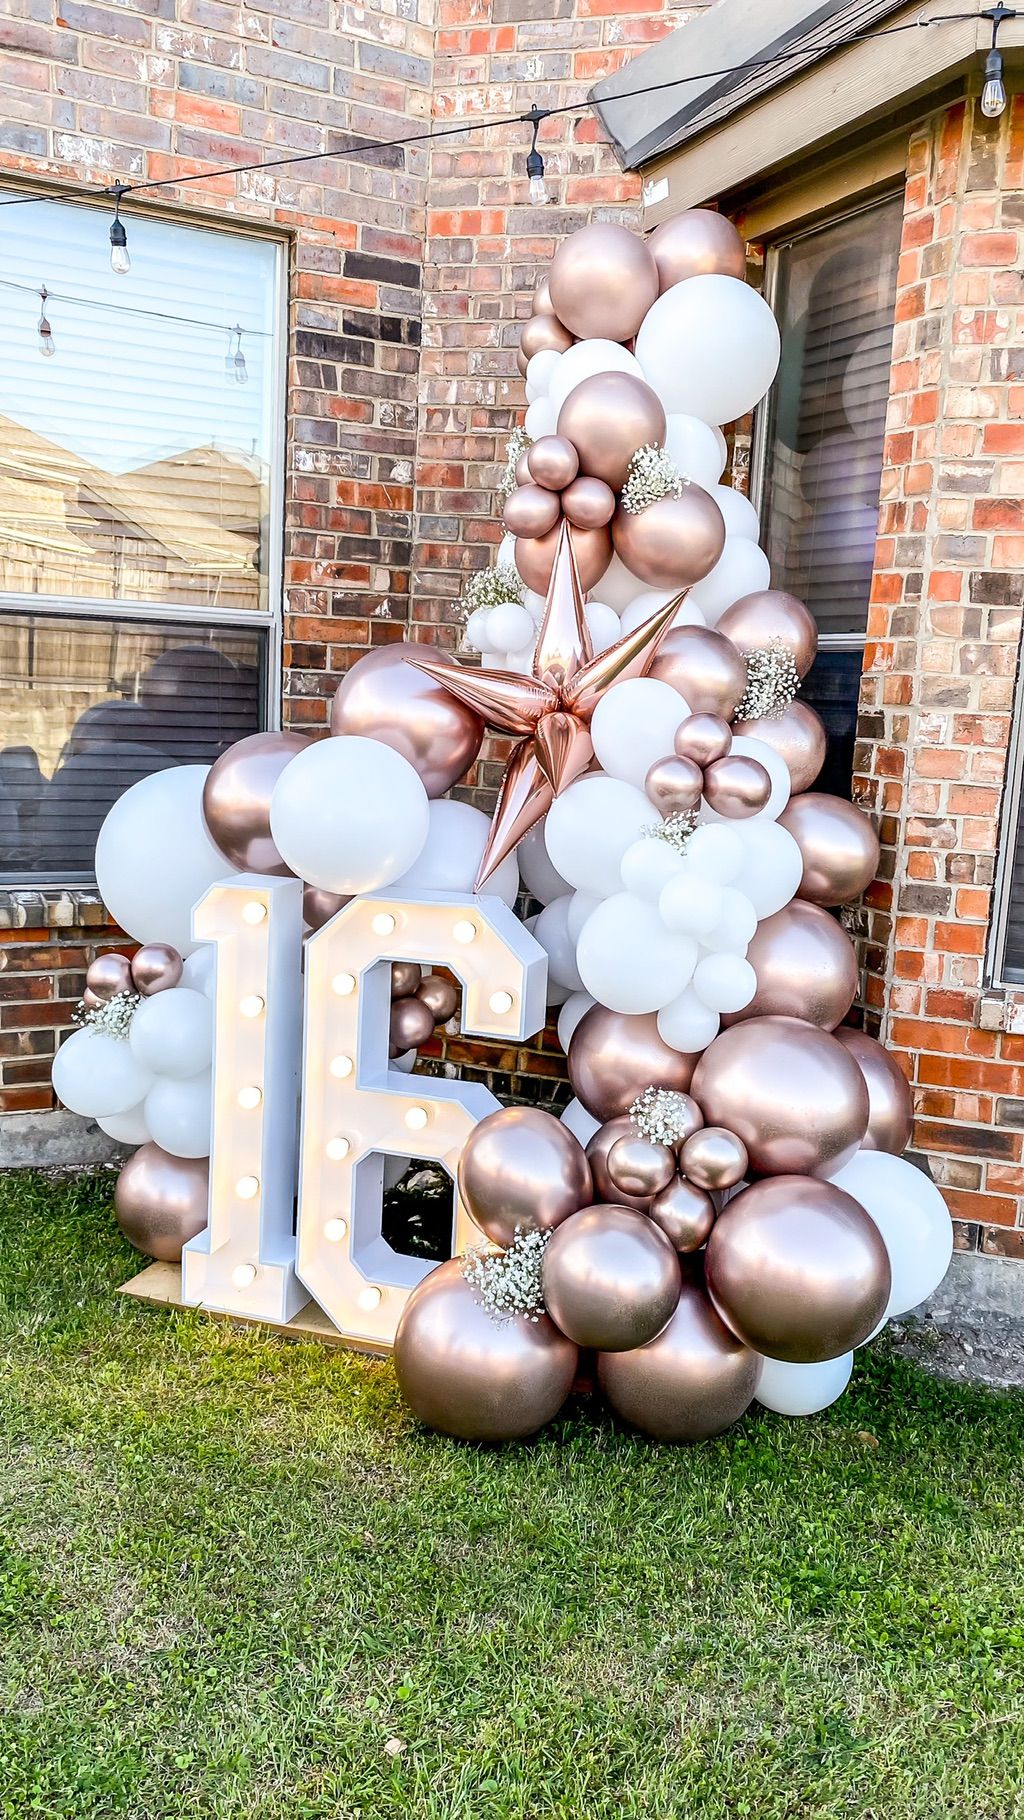 Clique Balloons & Events - DAL